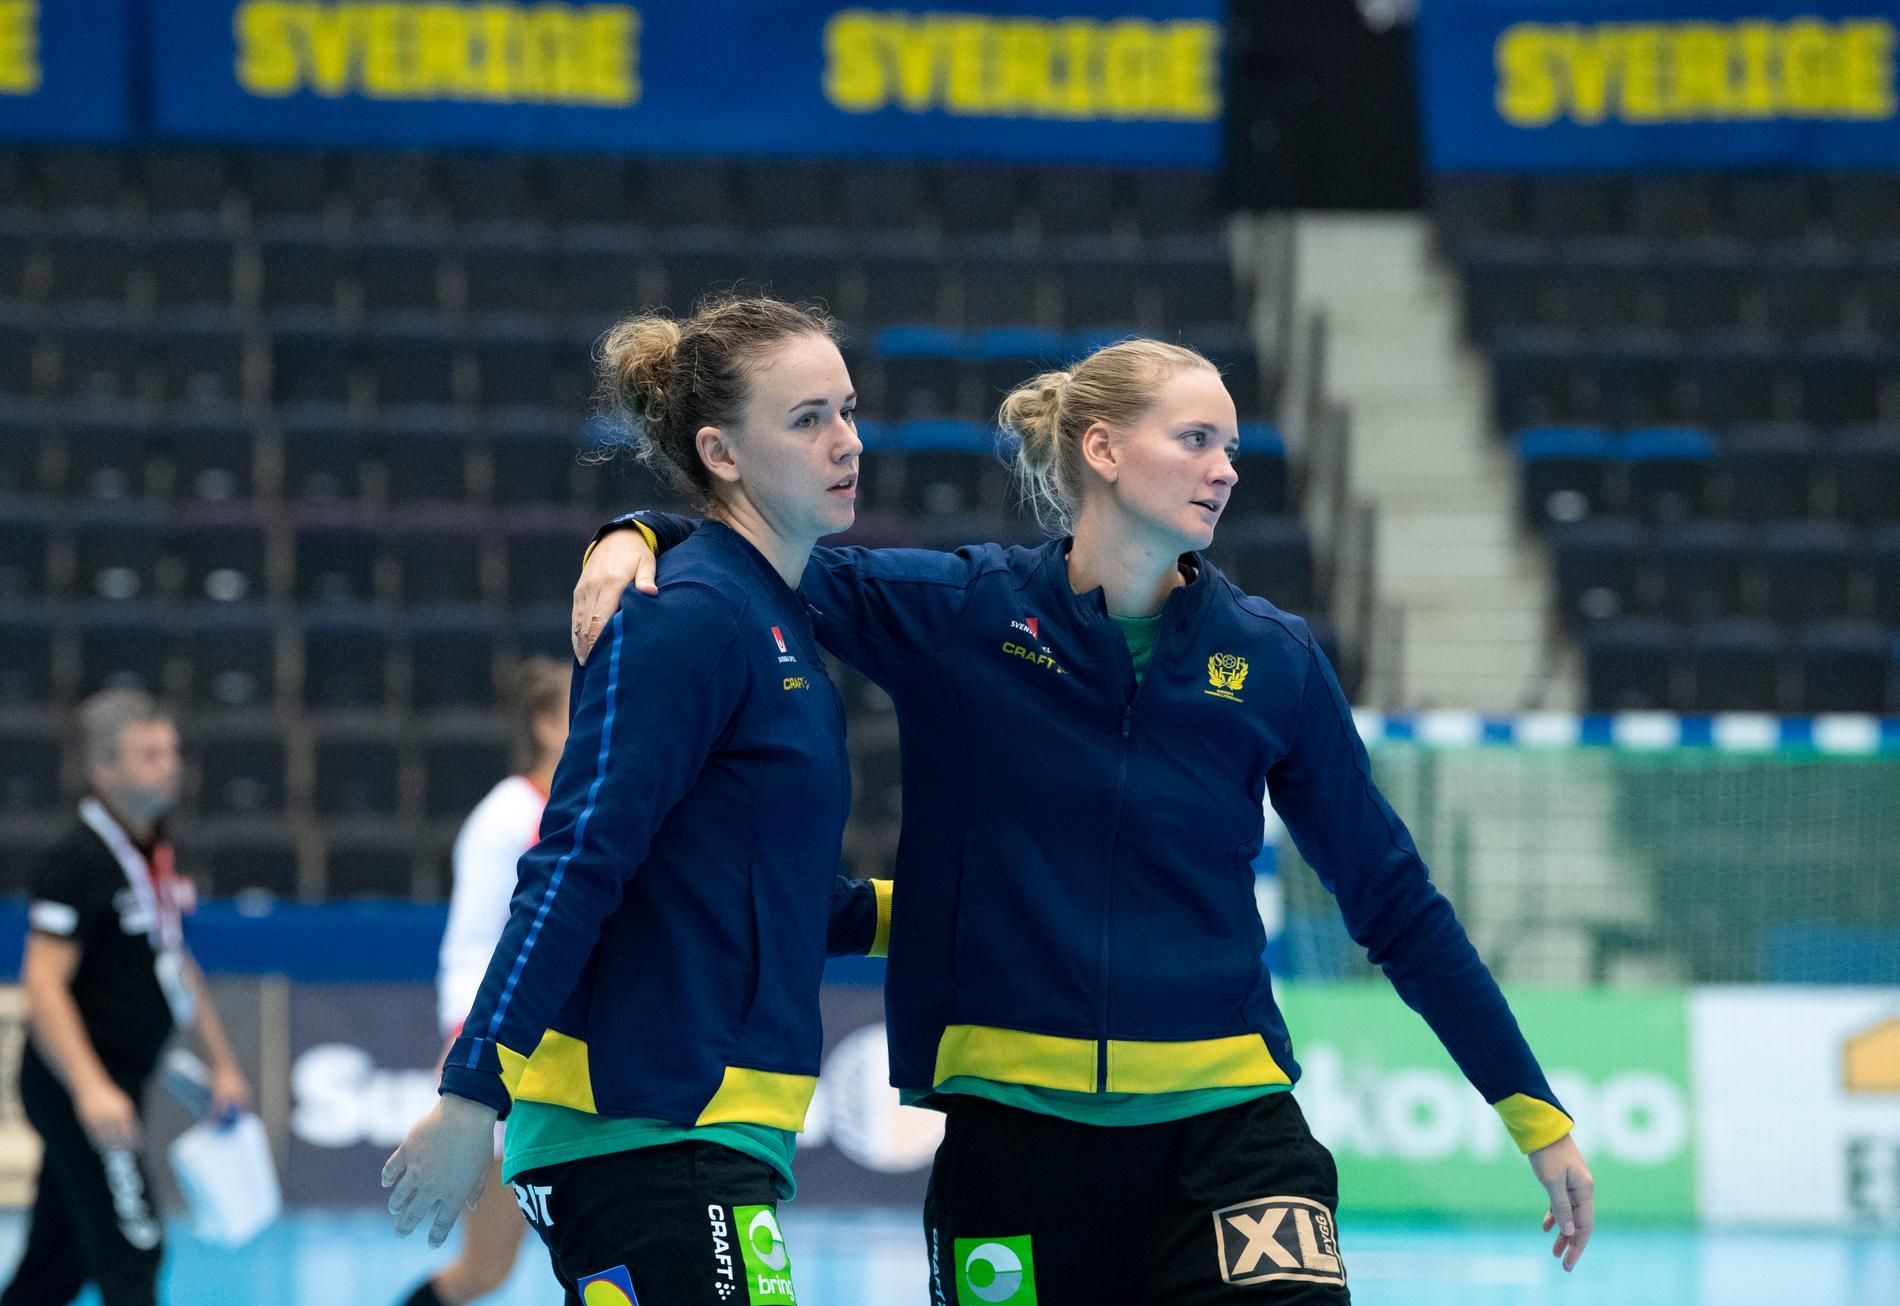 Jessica Ryde och Johanna Bundsen